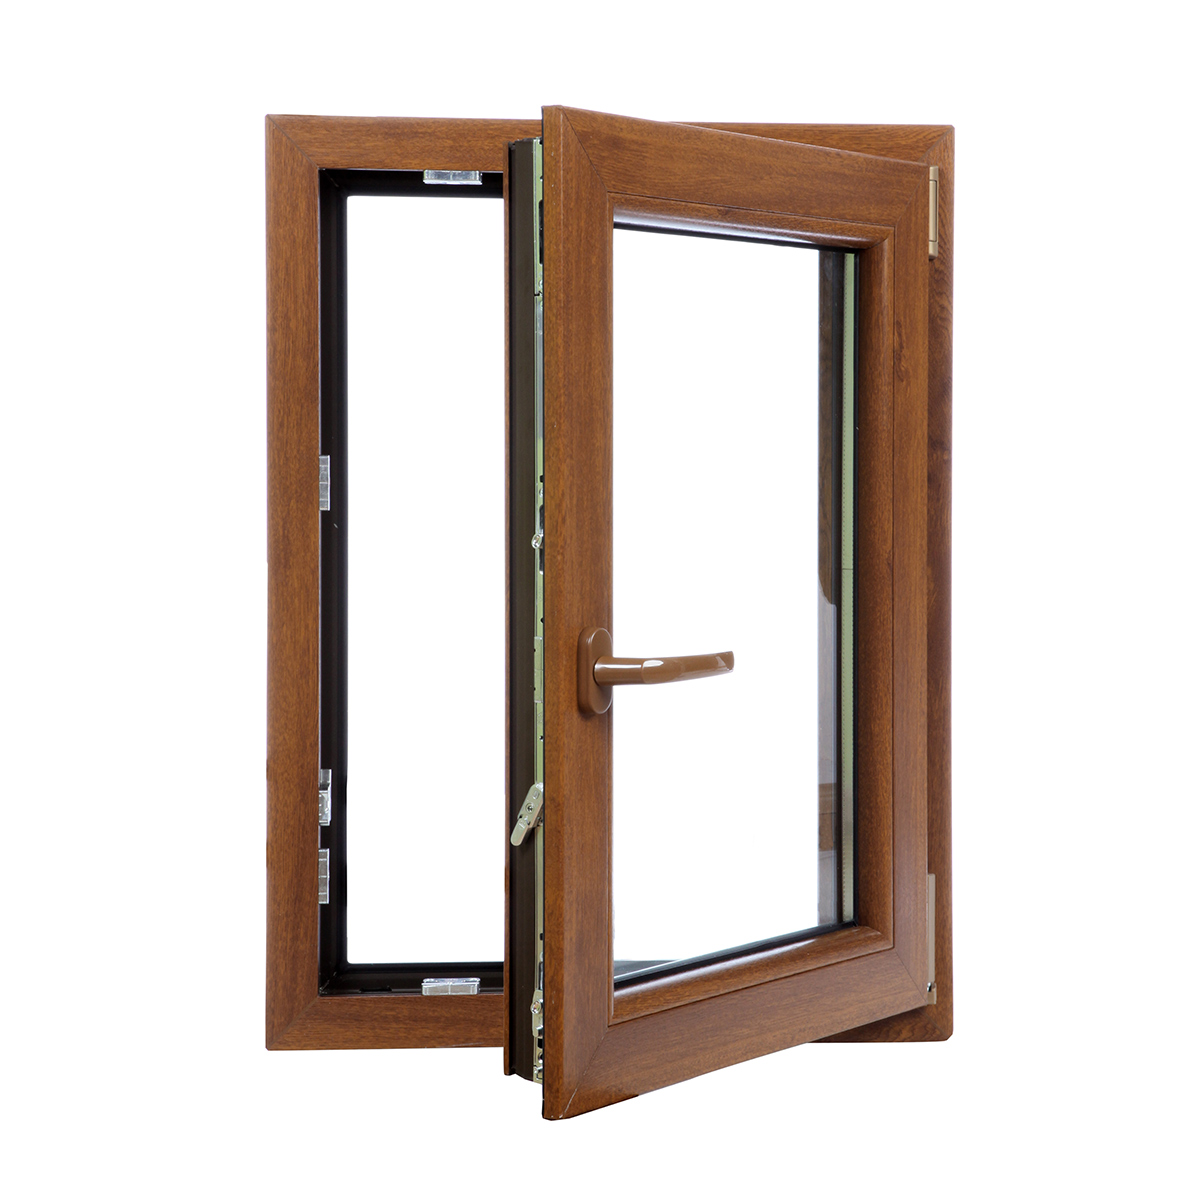 Upvc tilt turn frosted glass pvc double glazed window for Upvc window frame